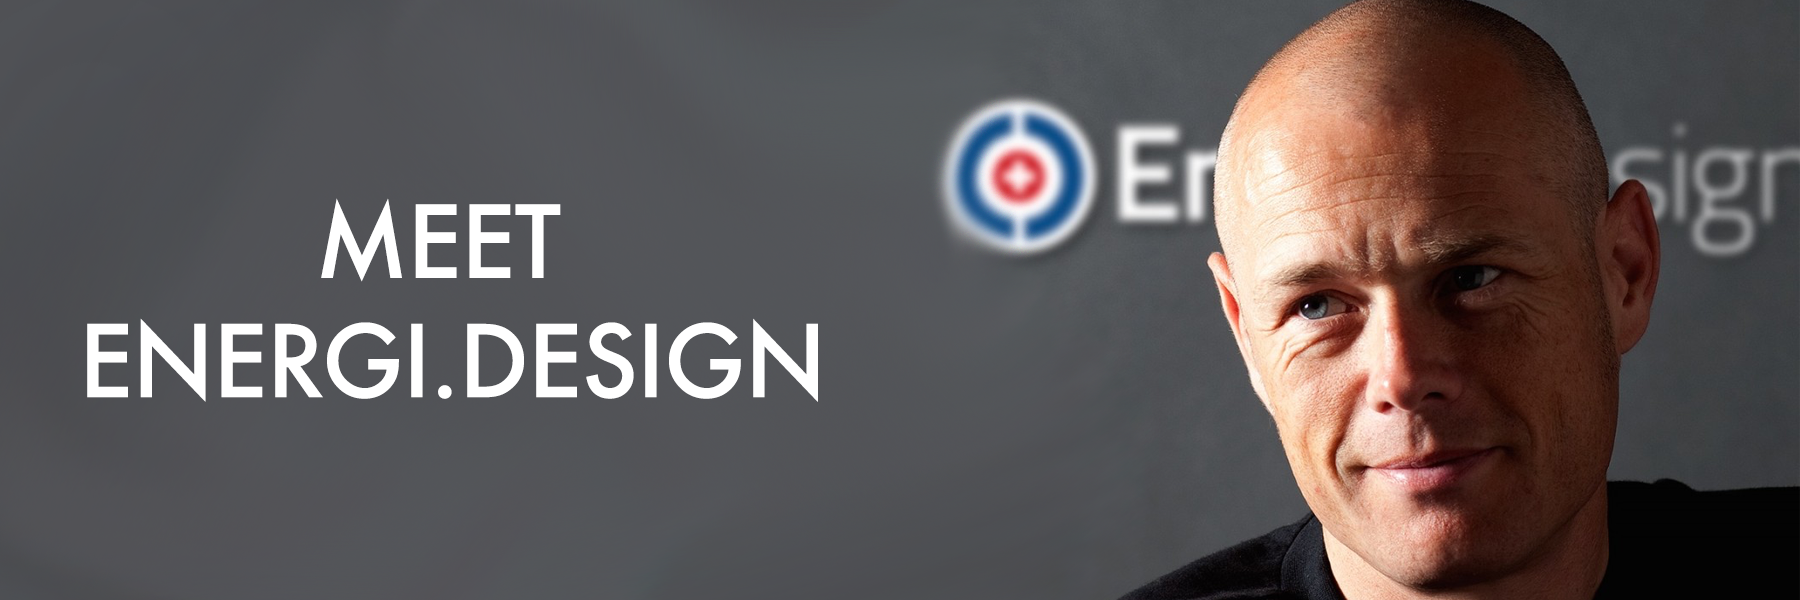 Meet Energi.design